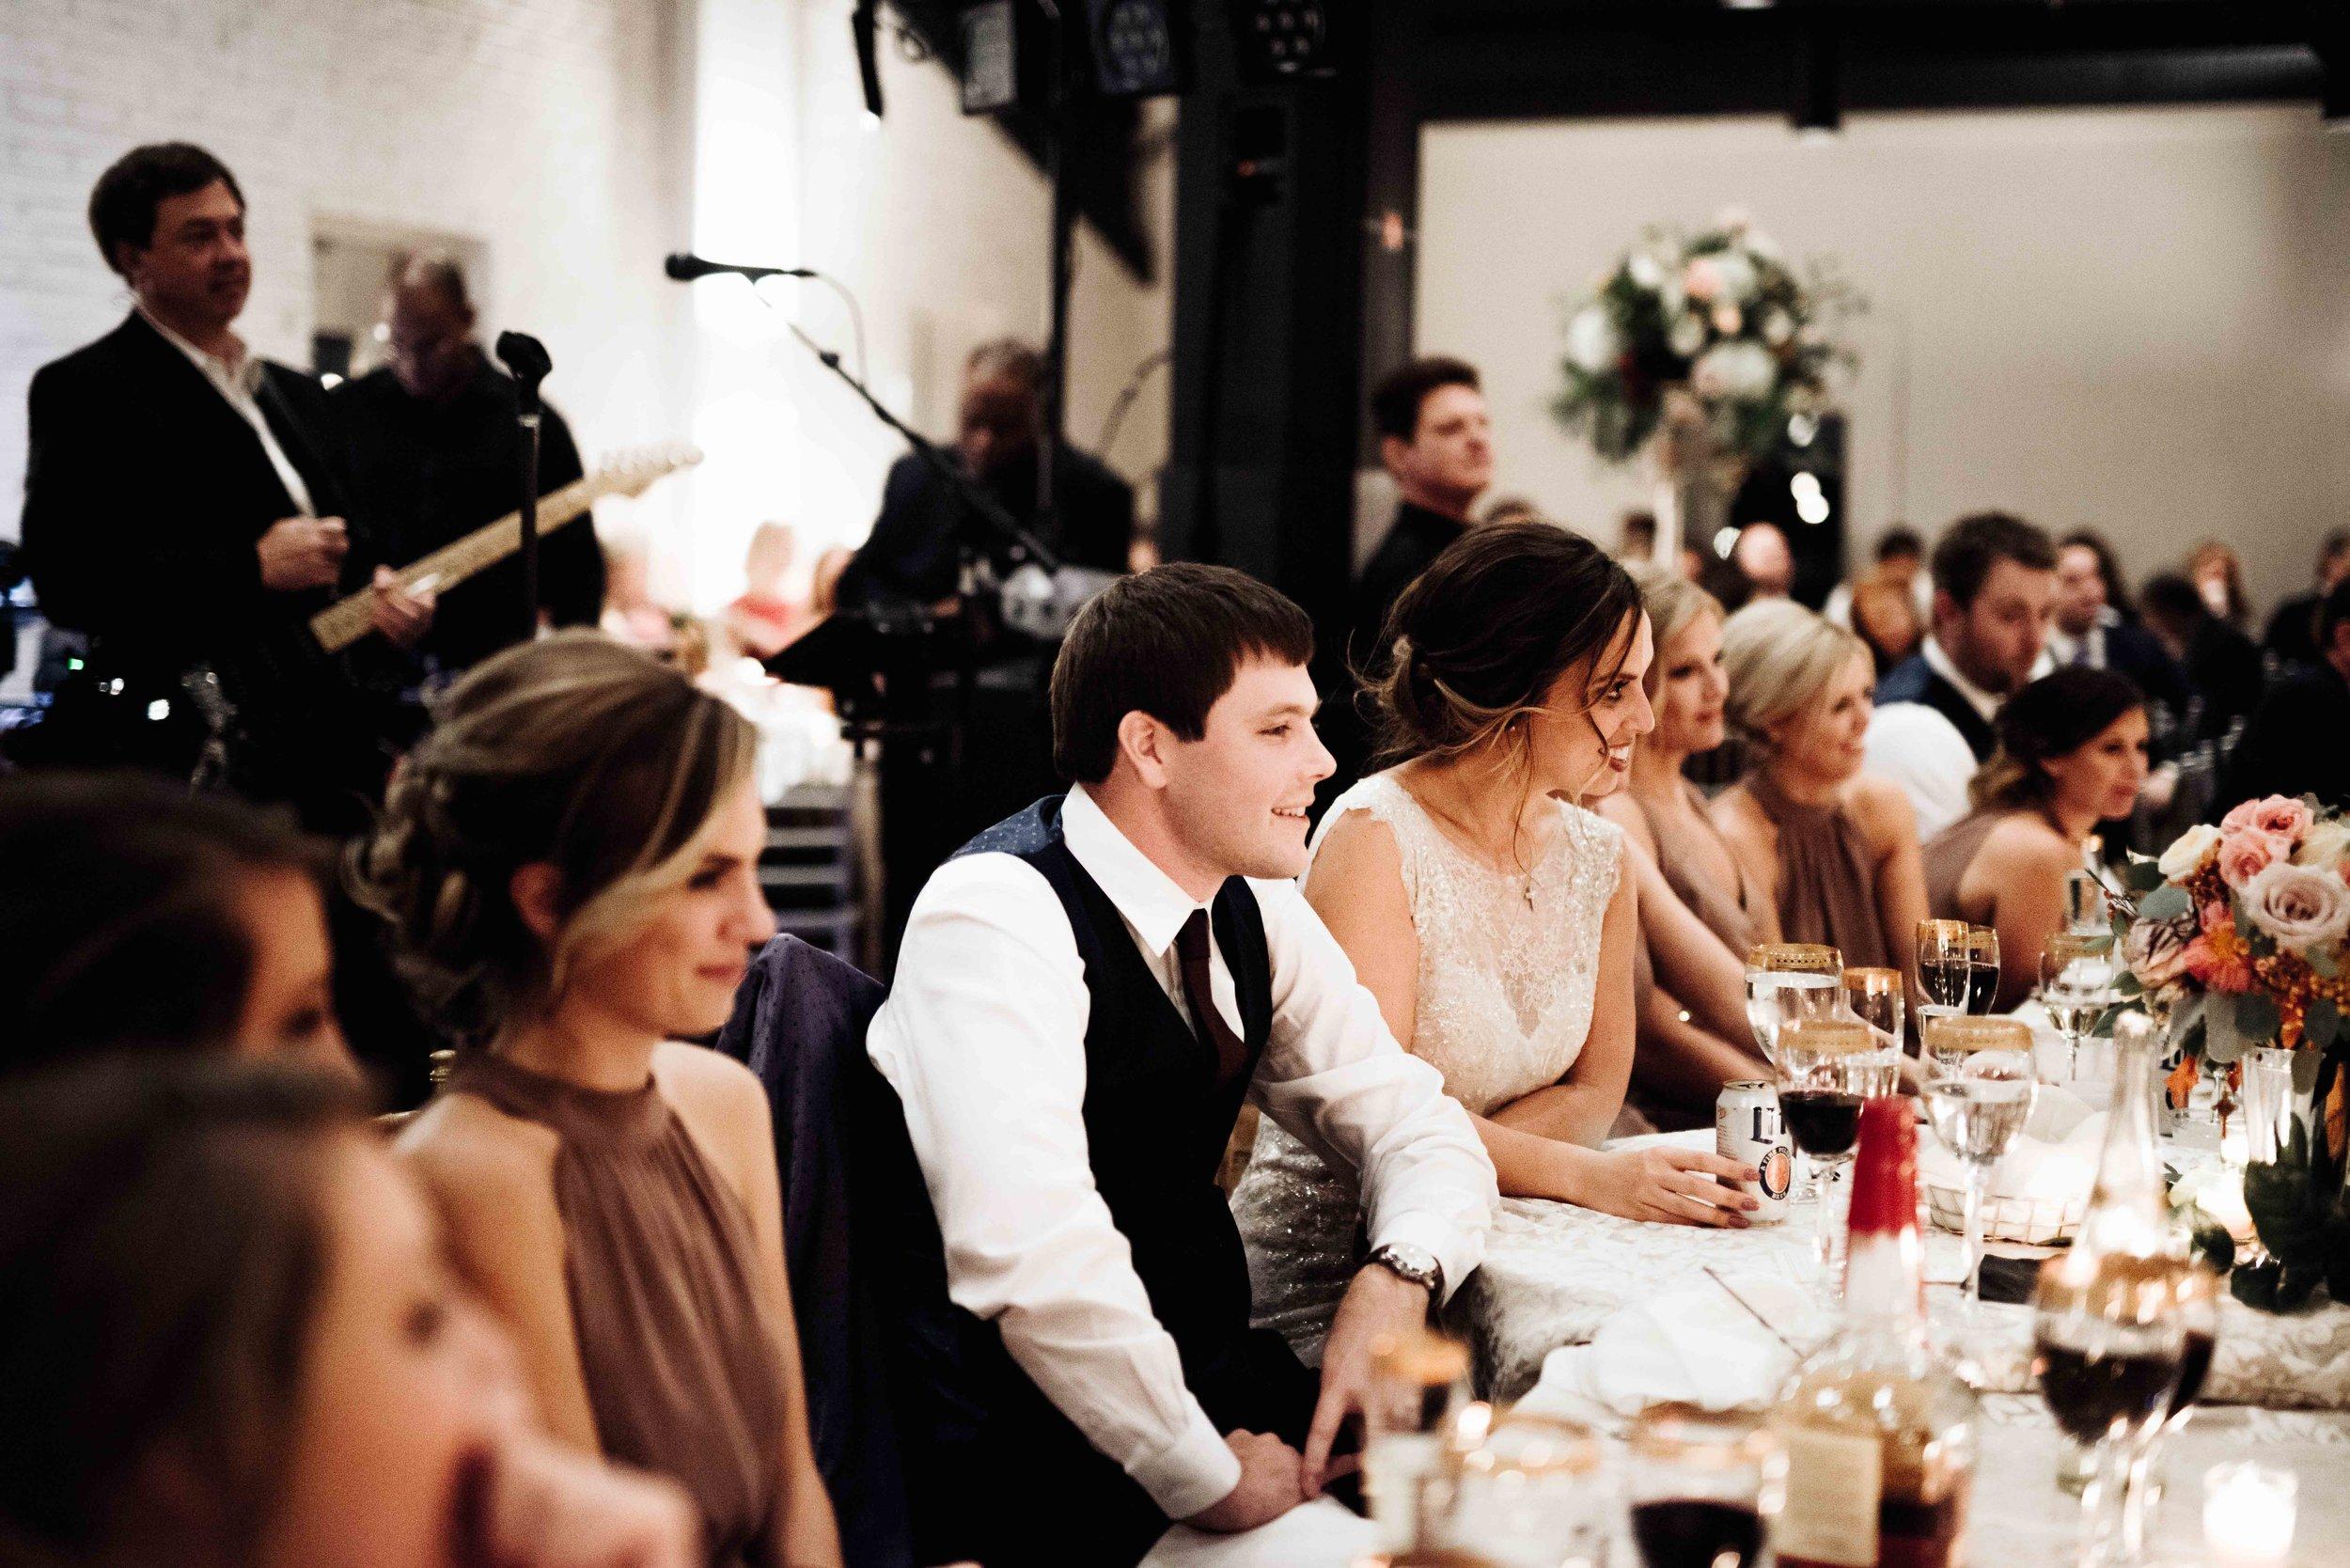 Carlee-Bob-Indianapolis-Wedding-Blog-104.jpg